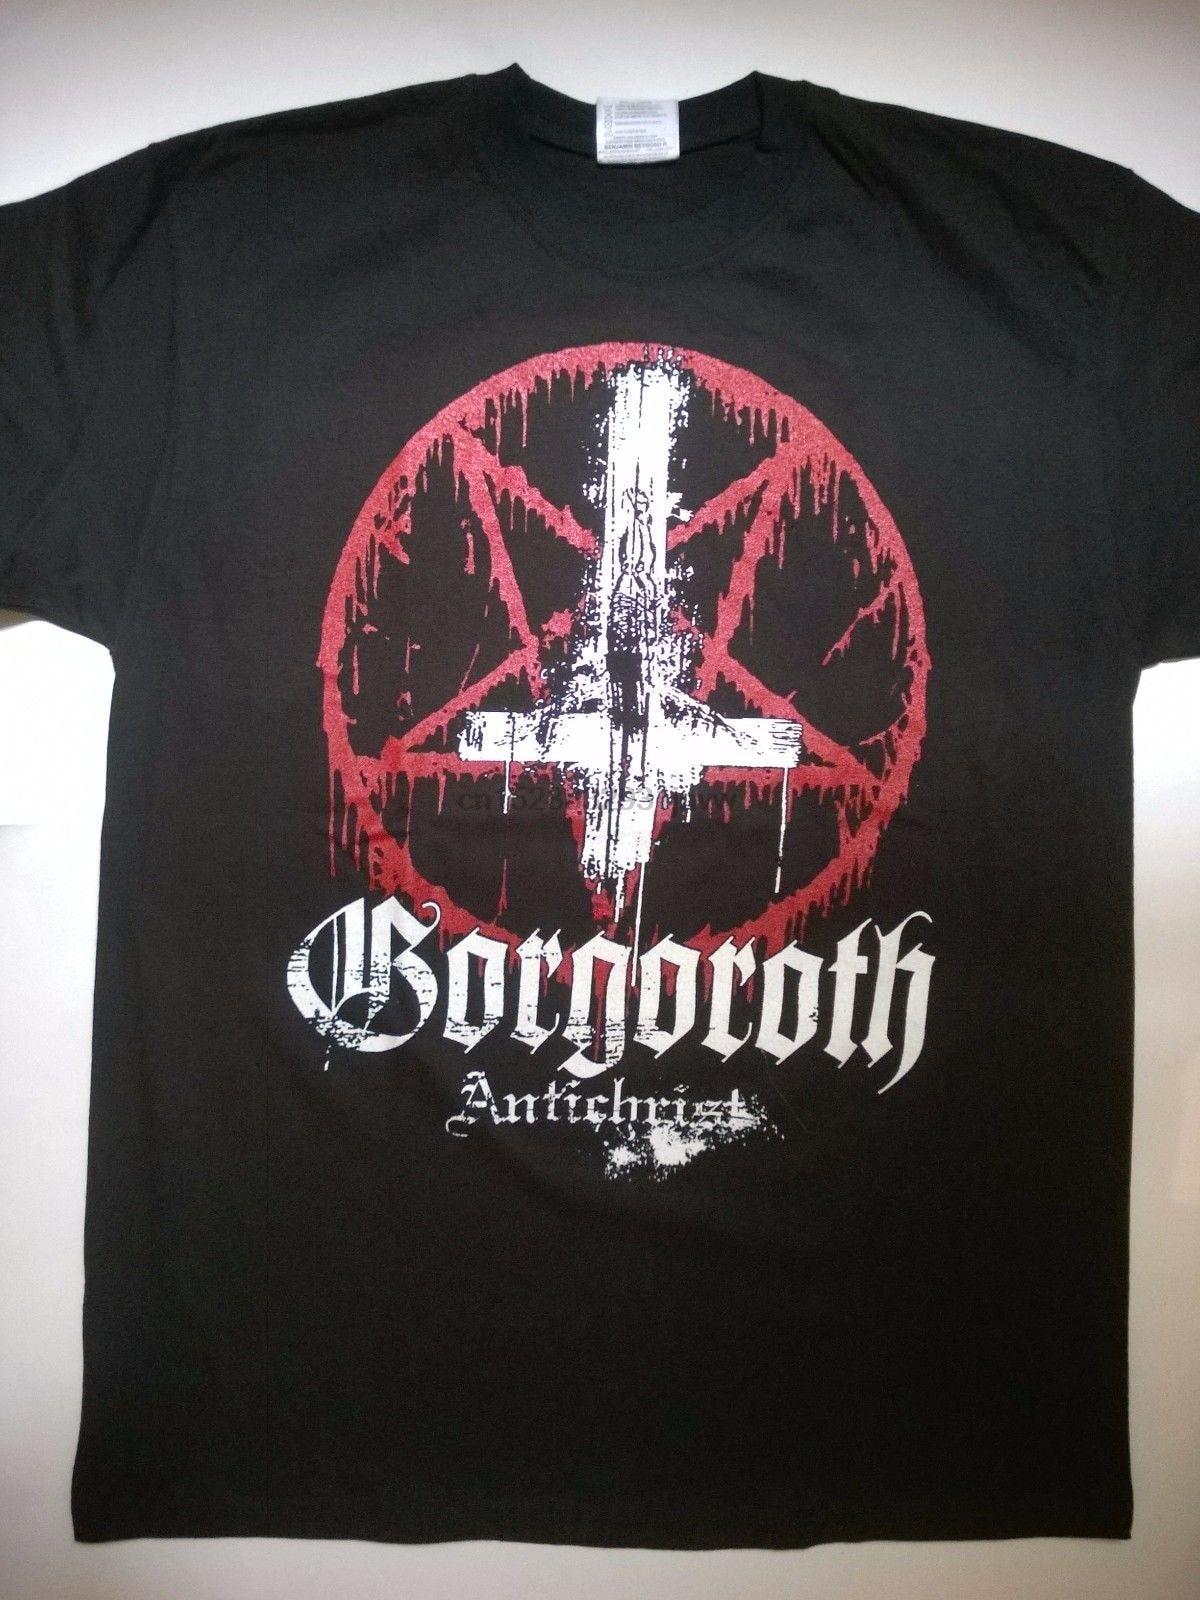 Gorgoroth-Camiseta Grande inmortal 1349 Marduk Tsjuder Taake, camiseta de manga de bosque...